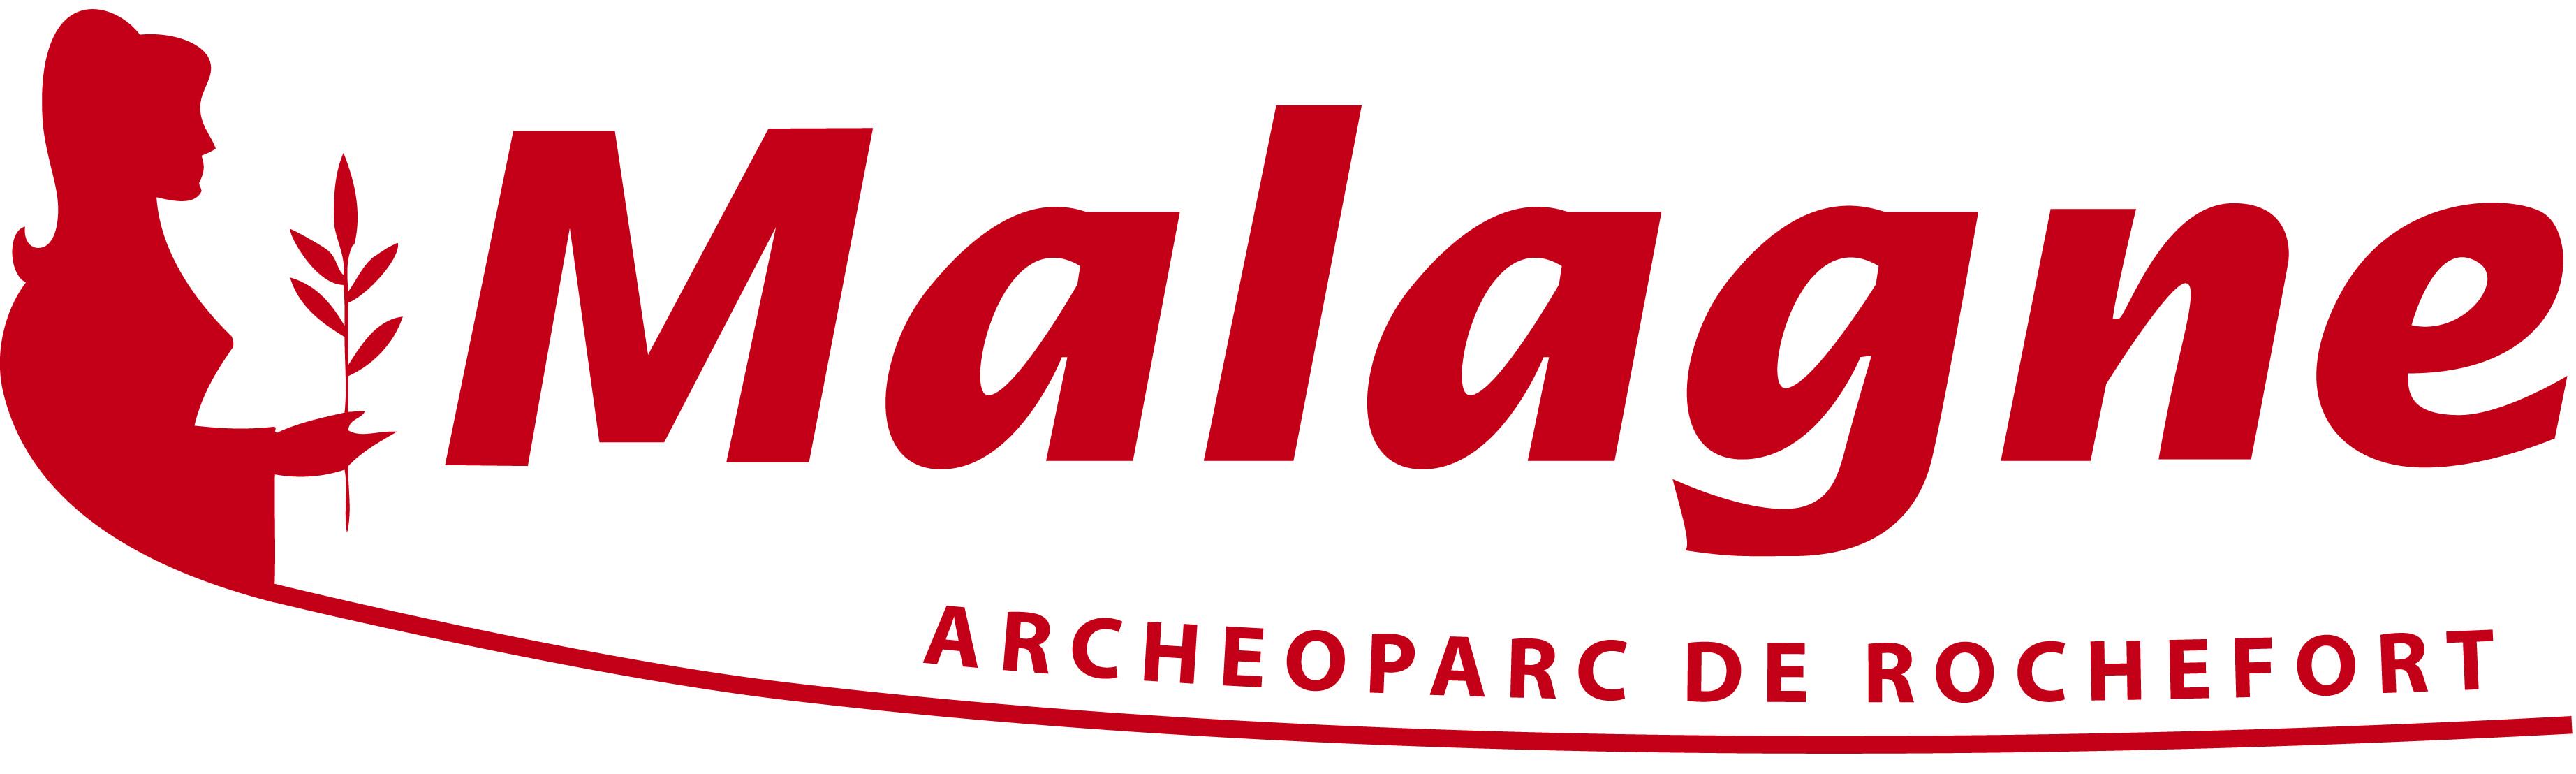 Malagne Rochefort Archaeopark